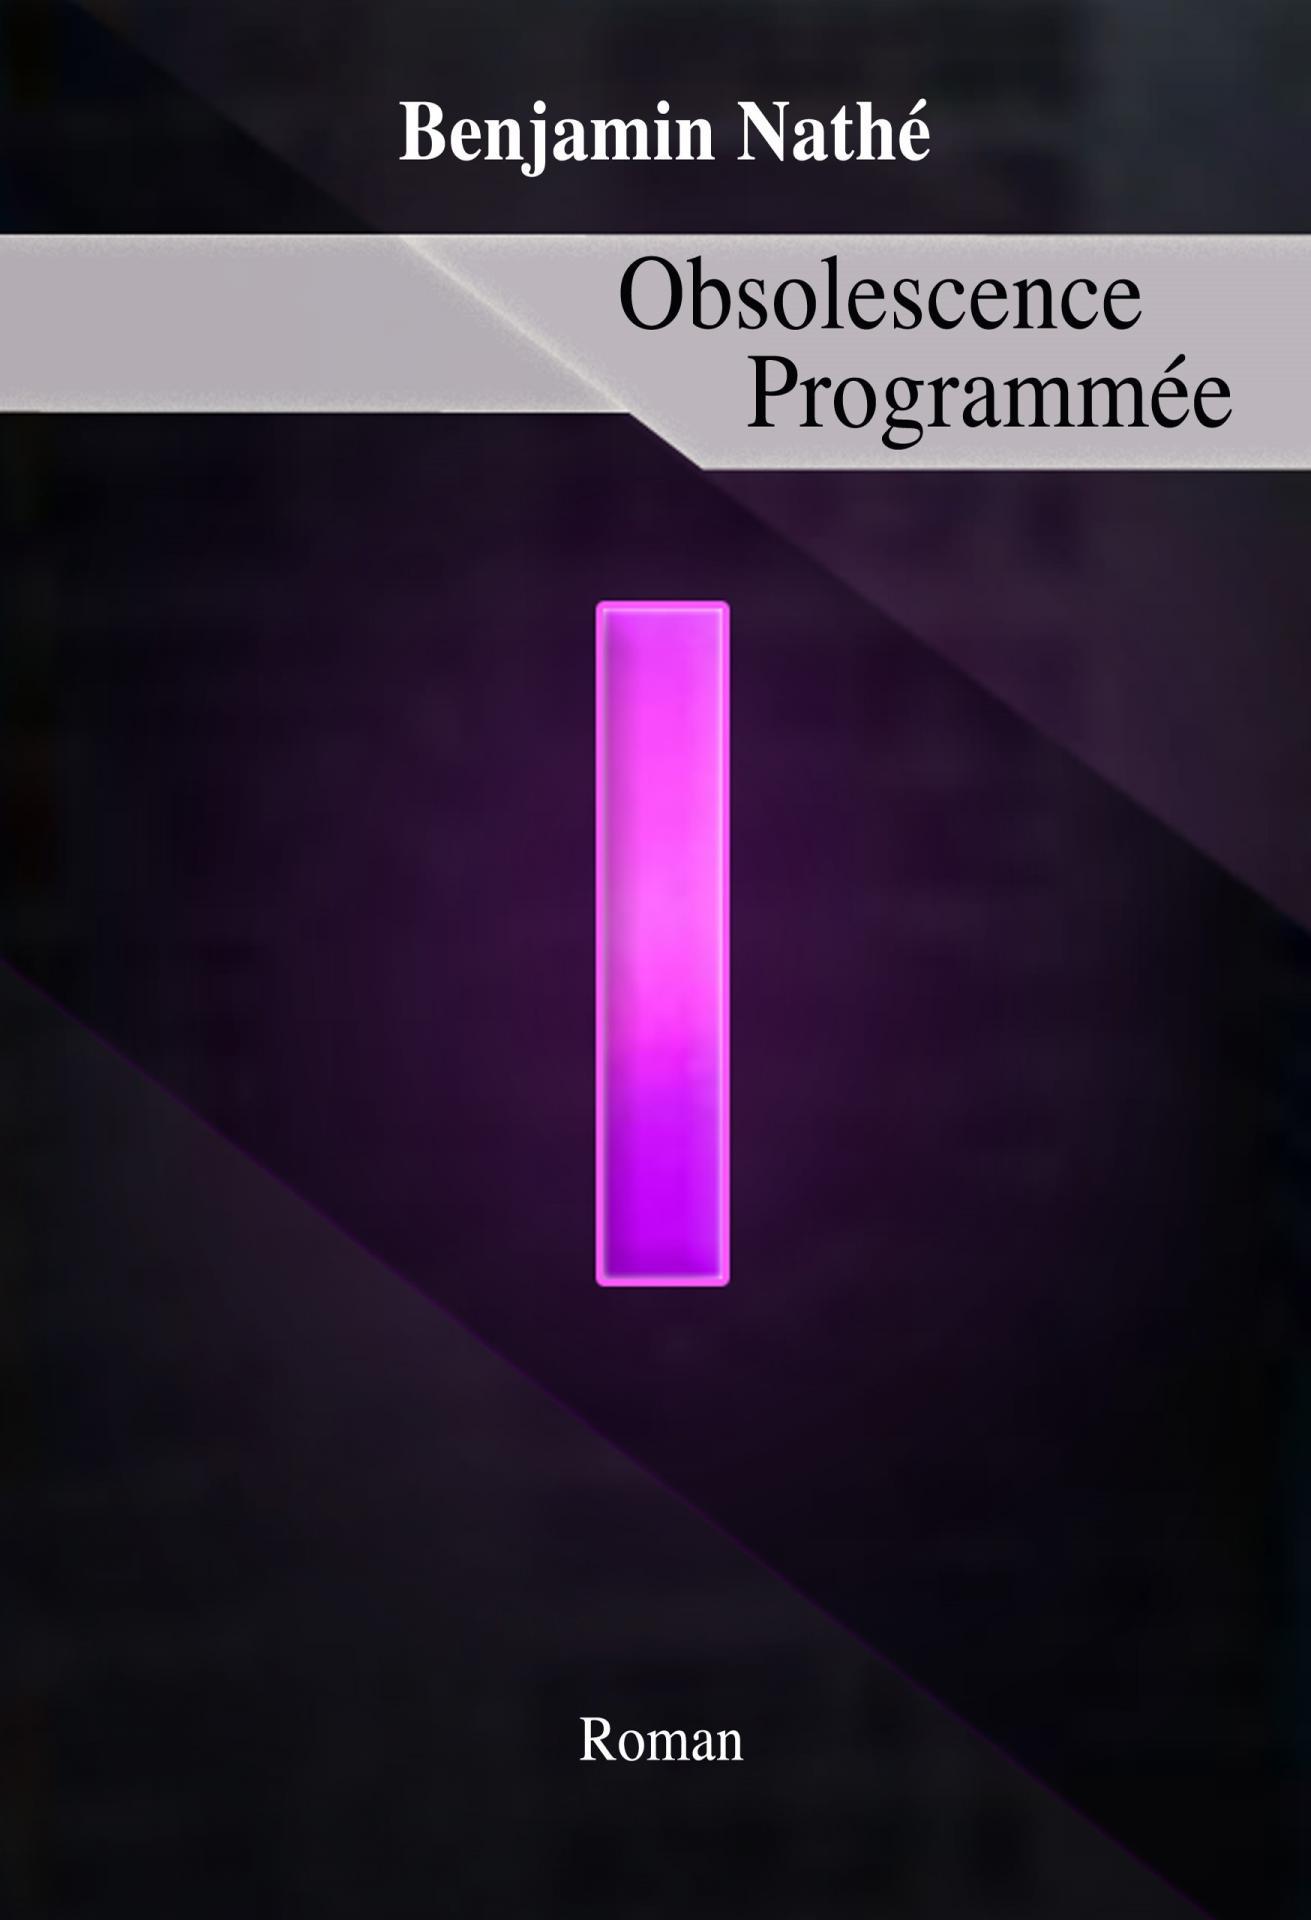 Obsolescence programmée, de B. Nathé